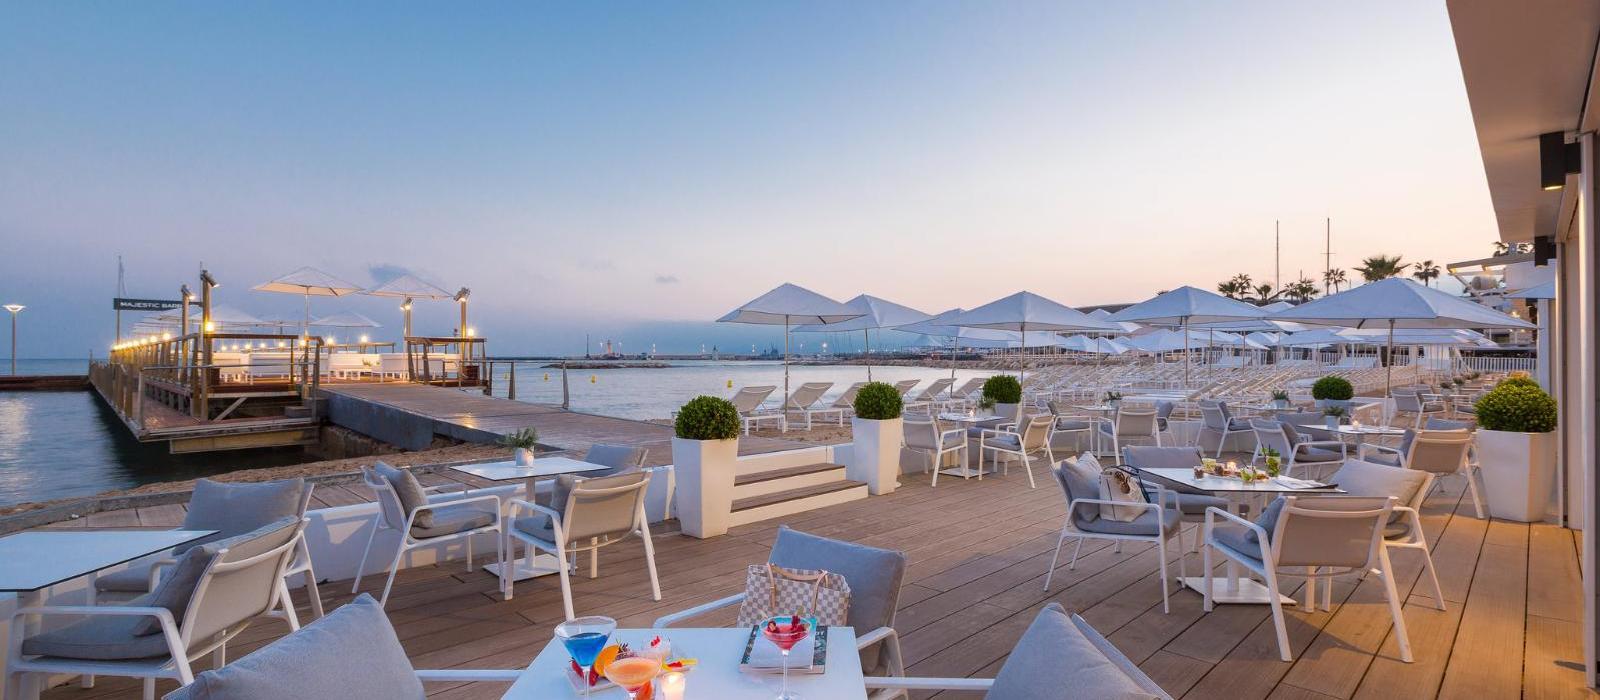 巴里耶尔马杰斯迪克酒店(Hotel Barriere Le Majestic Cannes) 海滩图片  www.lhw.cn